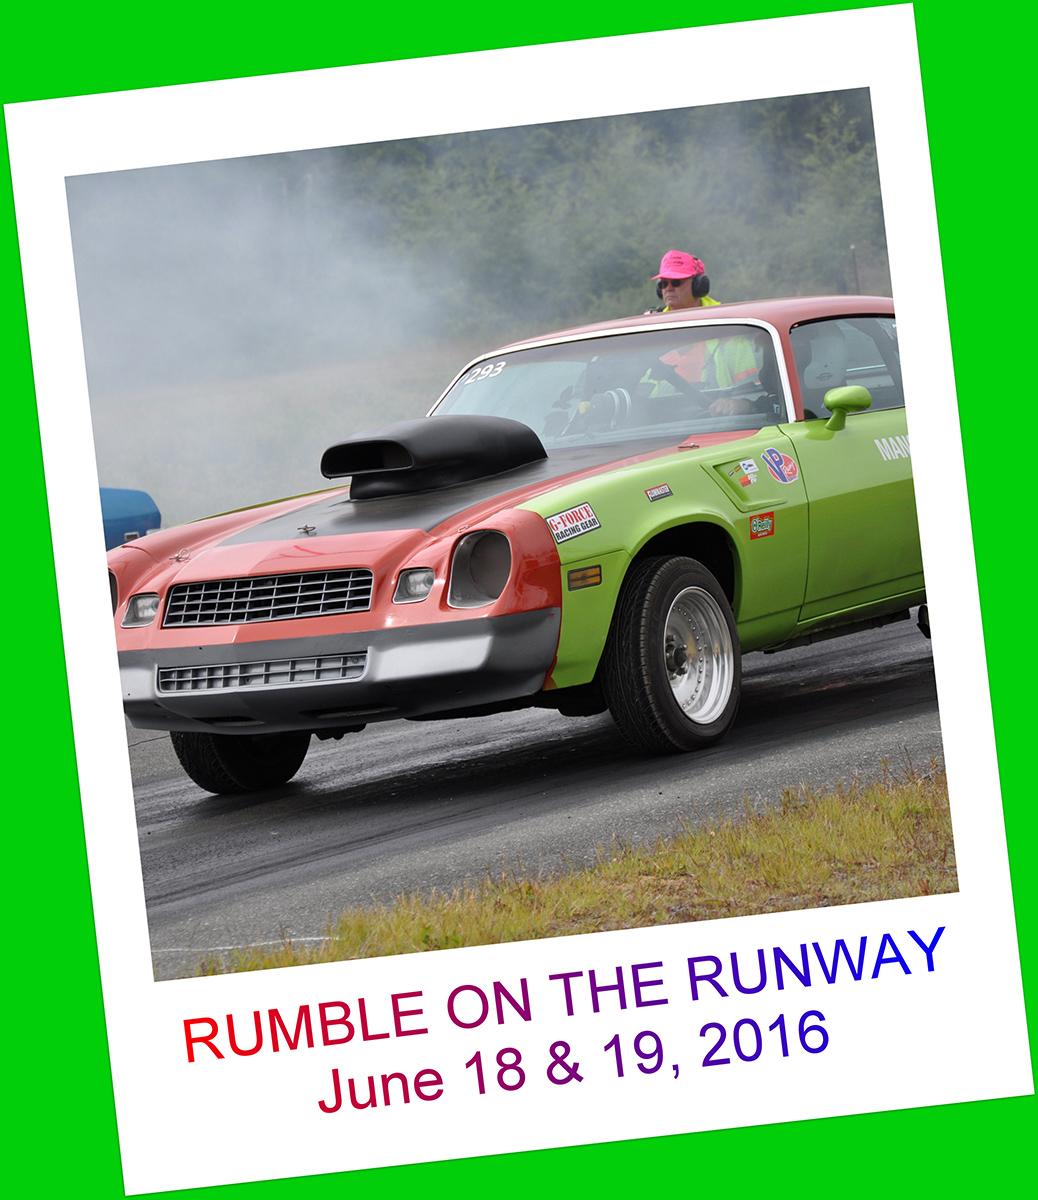 Rumble on the Runway June 18 & 19, 2016 1257